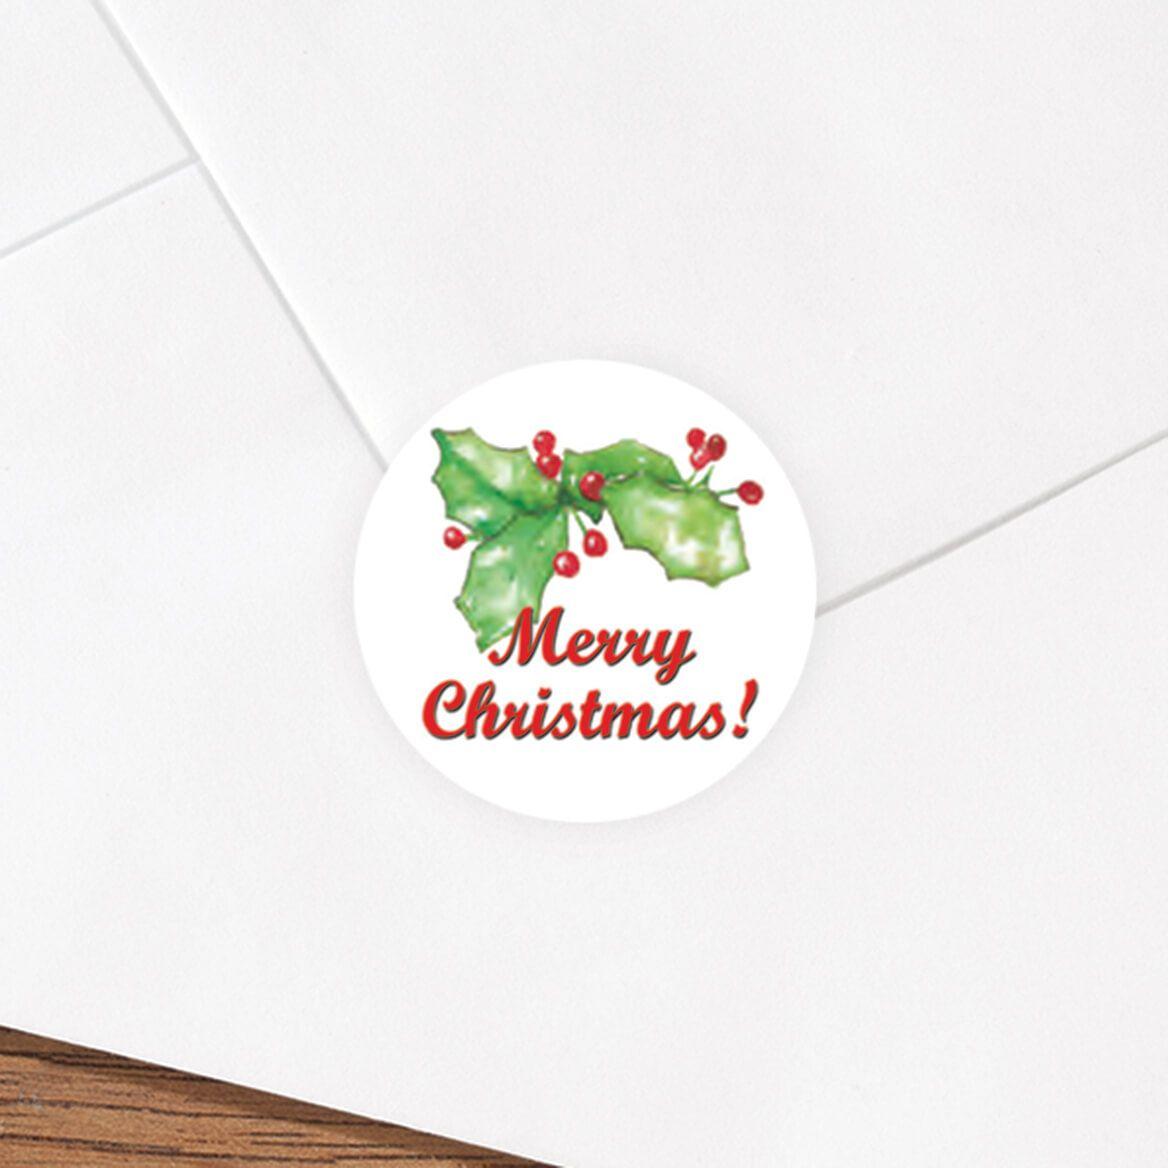 Merry Christmas Seals Set of 250-325251